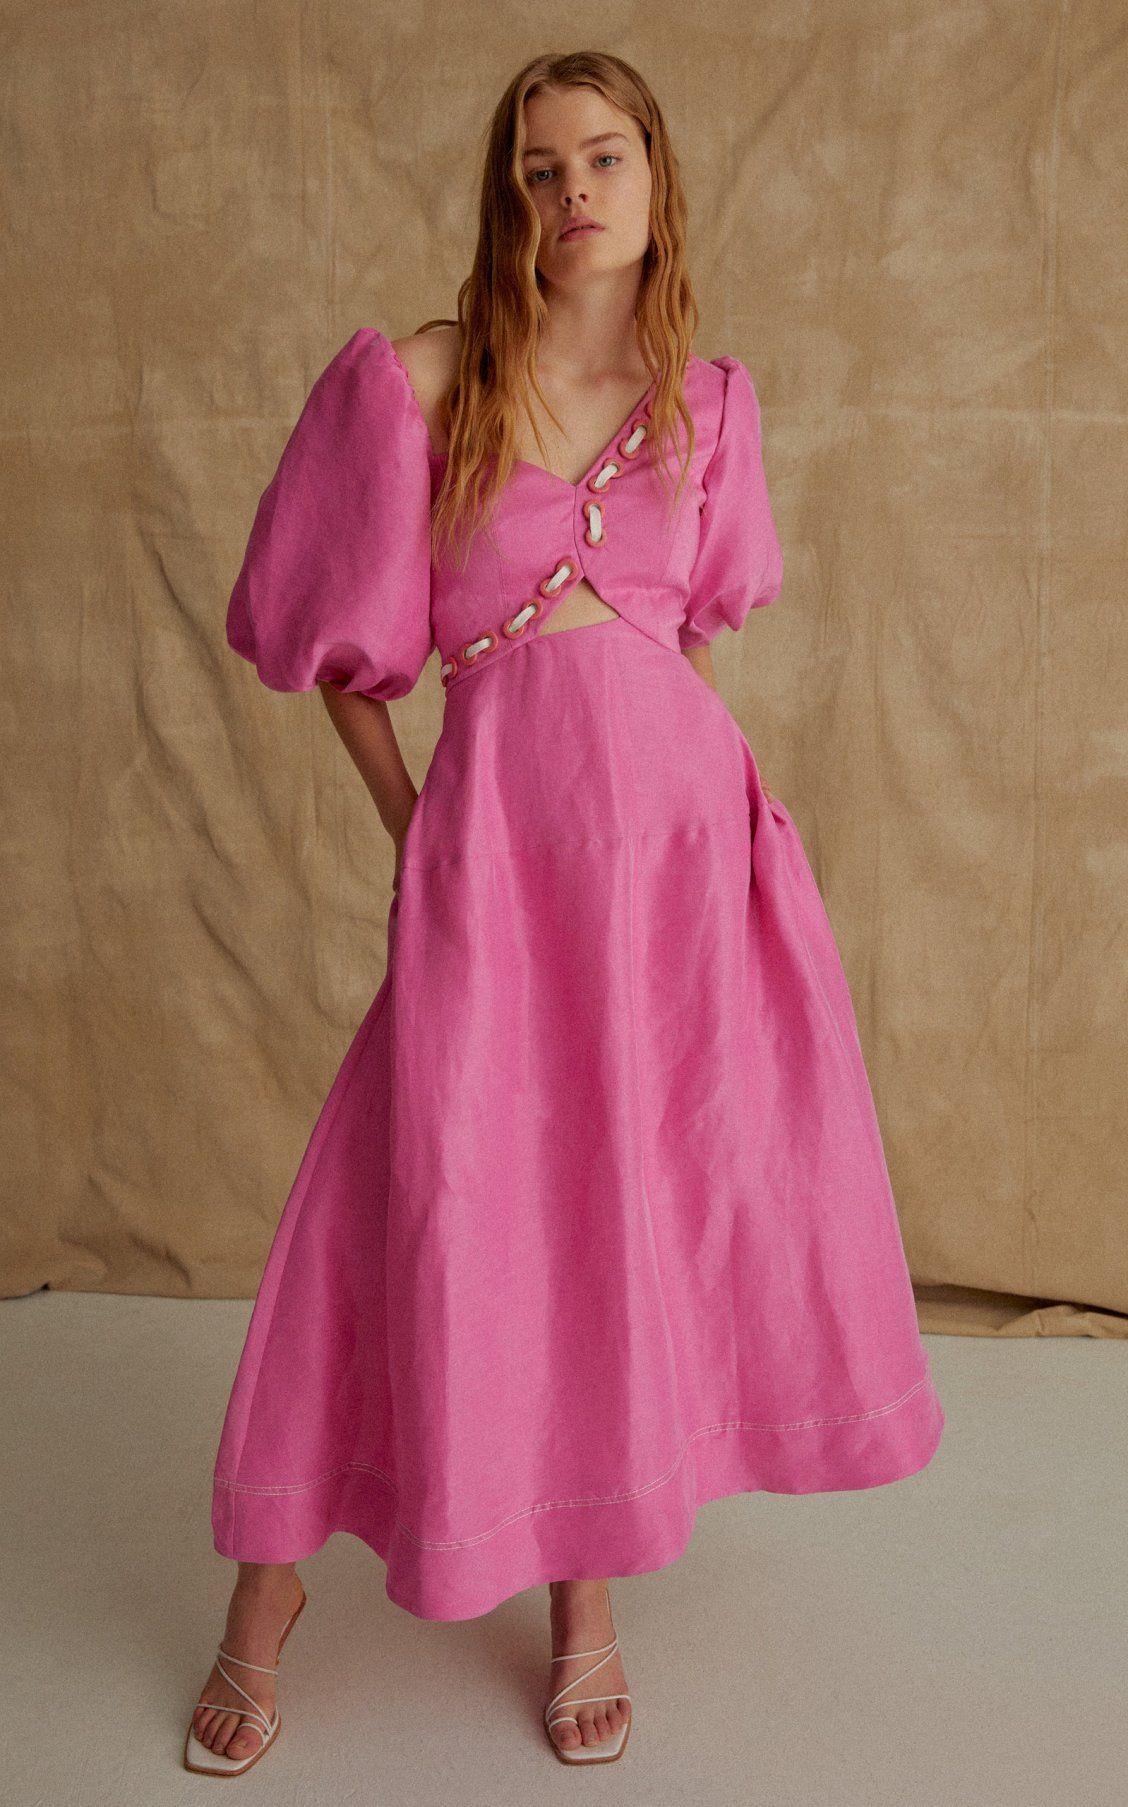 Moda Operandi Spring Summer 2020 Aje Pink Gathered Cotton Blend Smock Mini Silhouette Cinched Detail V Neck Puffed Sle Dresses Midi Dress Fashion Outfits [ 1807 x 1128 Pixel ]